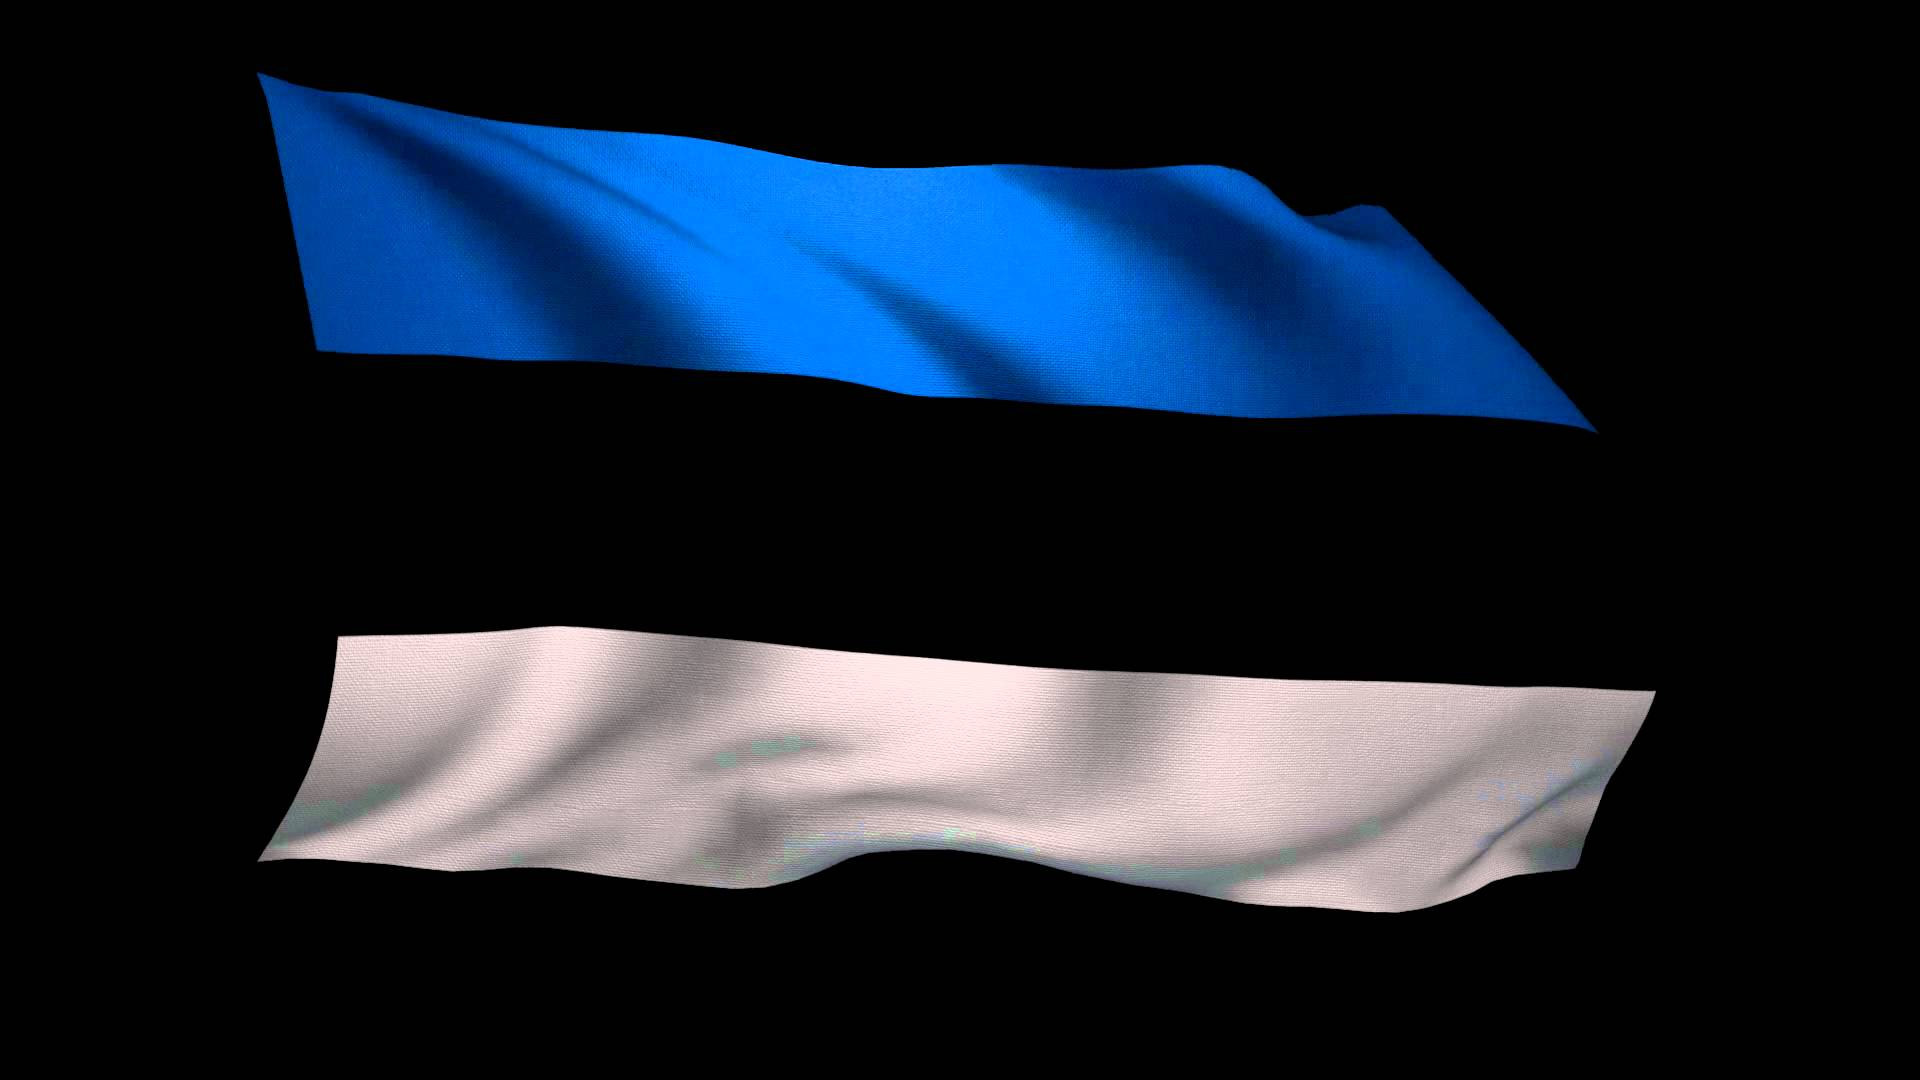 1920x1080 > Flag Of Estonia Wallpapers